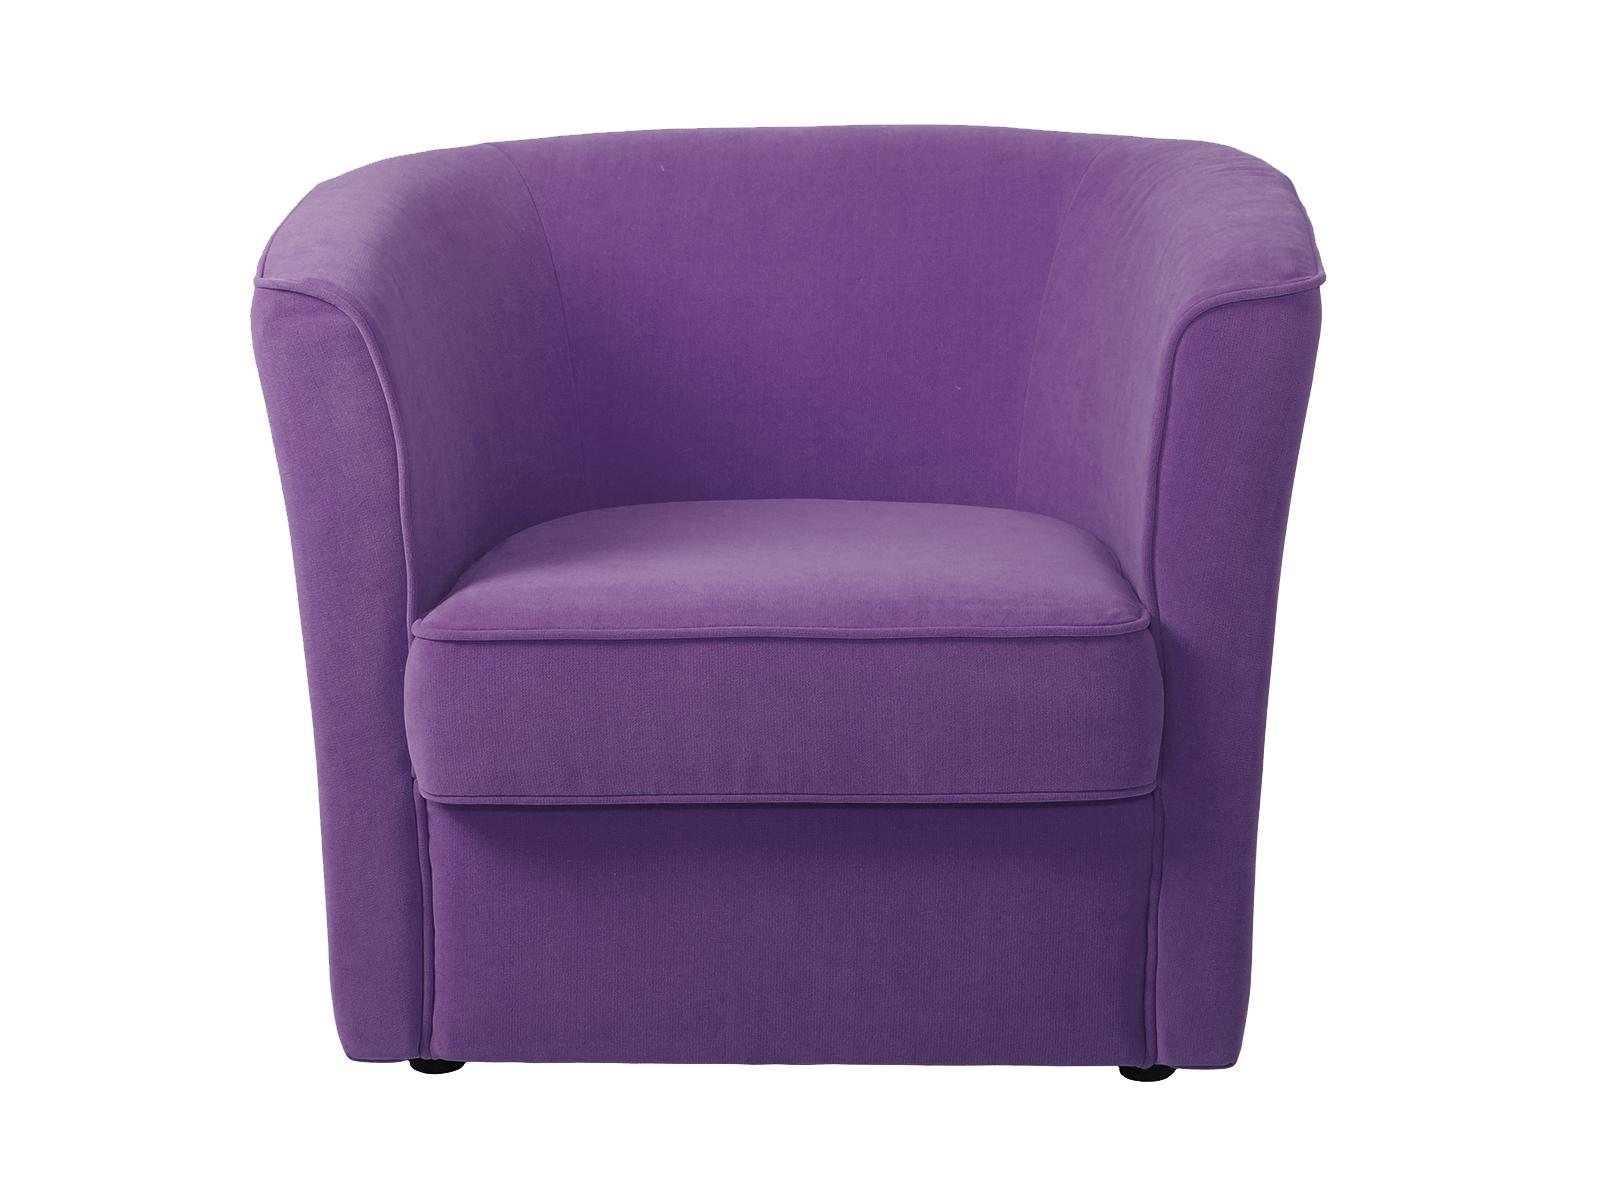 Кресло CaliforniaИнтерьерные кресла<br>Материалы:Каркас: деревянный брус, фанера.Сиденье: пенополиуретан, холлофайбер.Лицевой чехол: несъёмный.Ткань Amstel MOV9<br><br>kit: None<br>gender: None